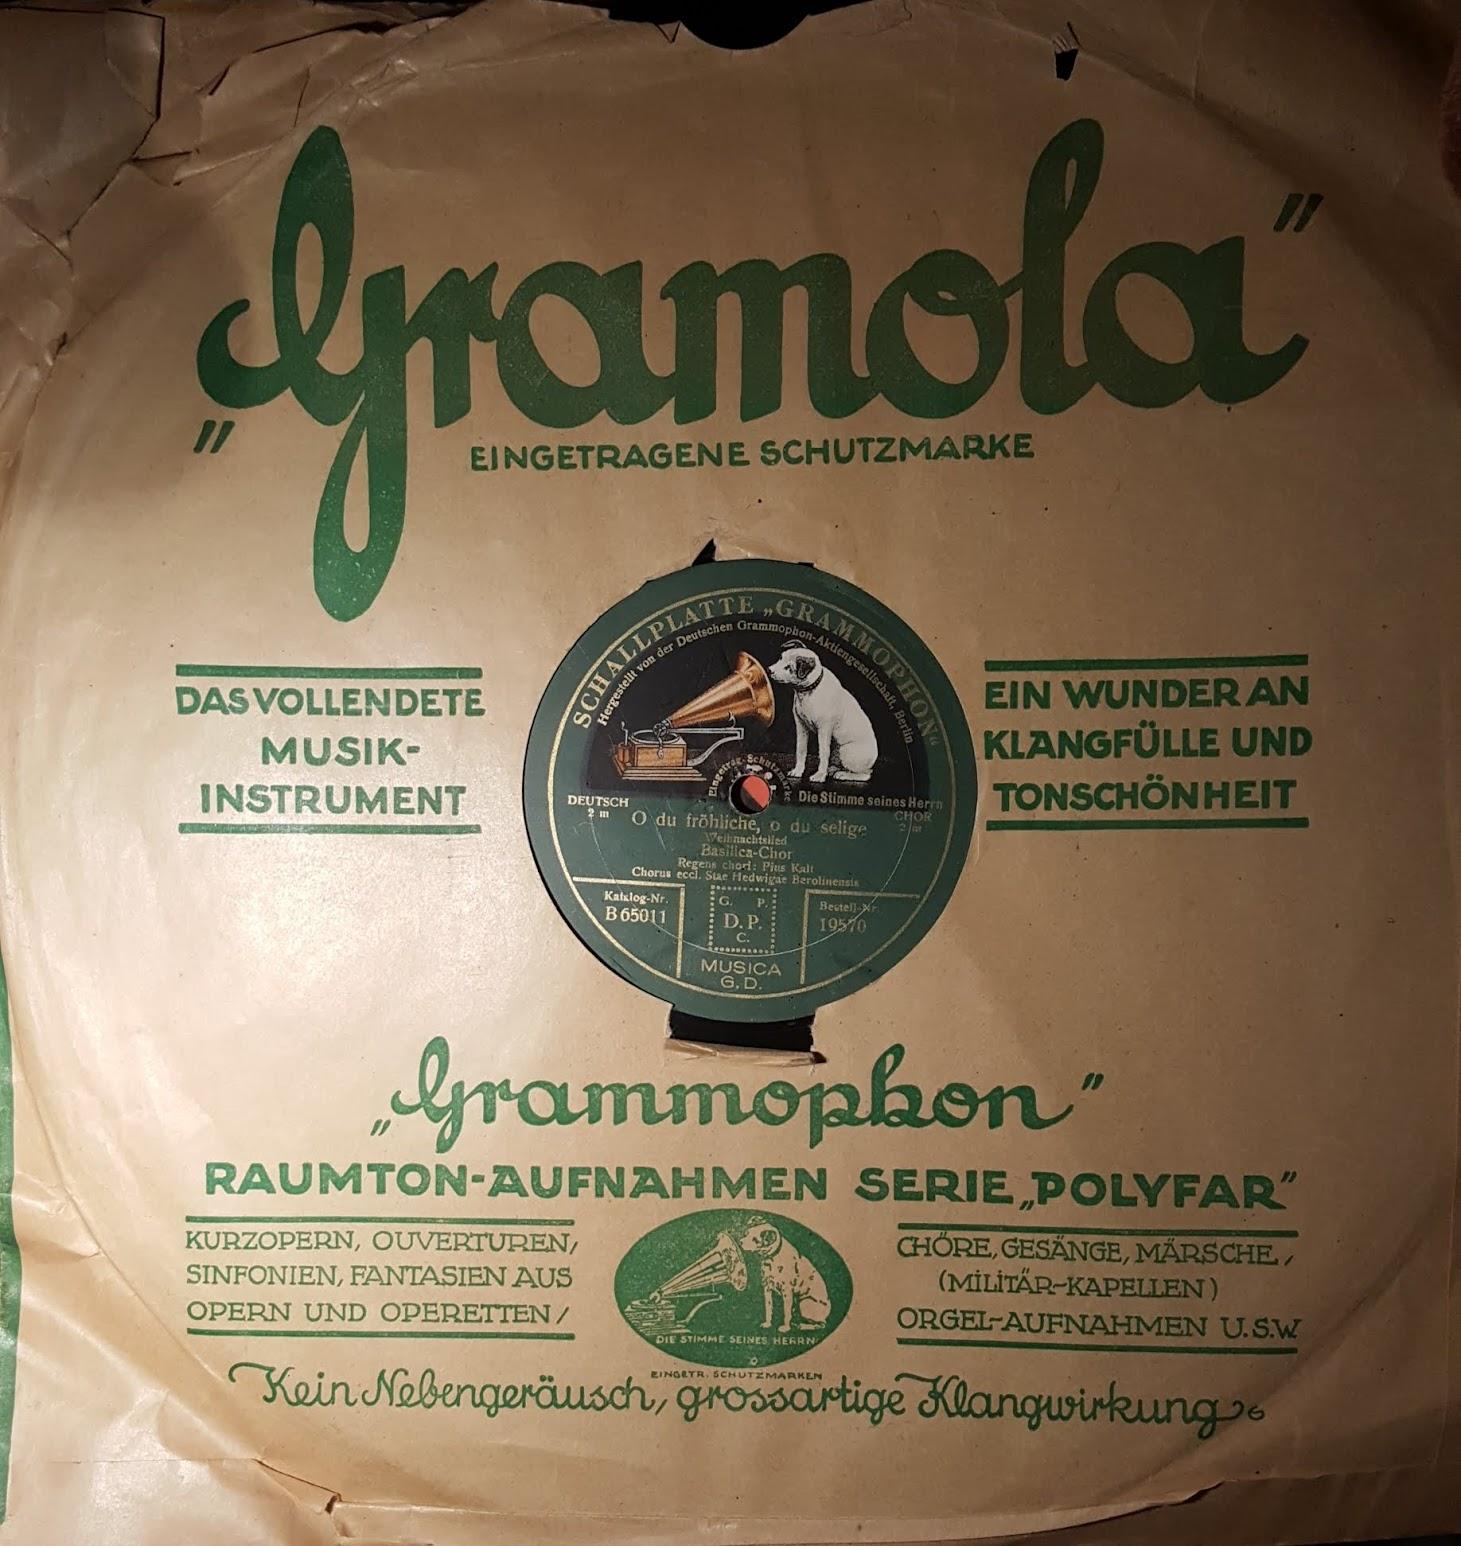 Polyfar Grammophon-Platte Gramola, Weihnachtsmusik, O du fröhliche, o du selige